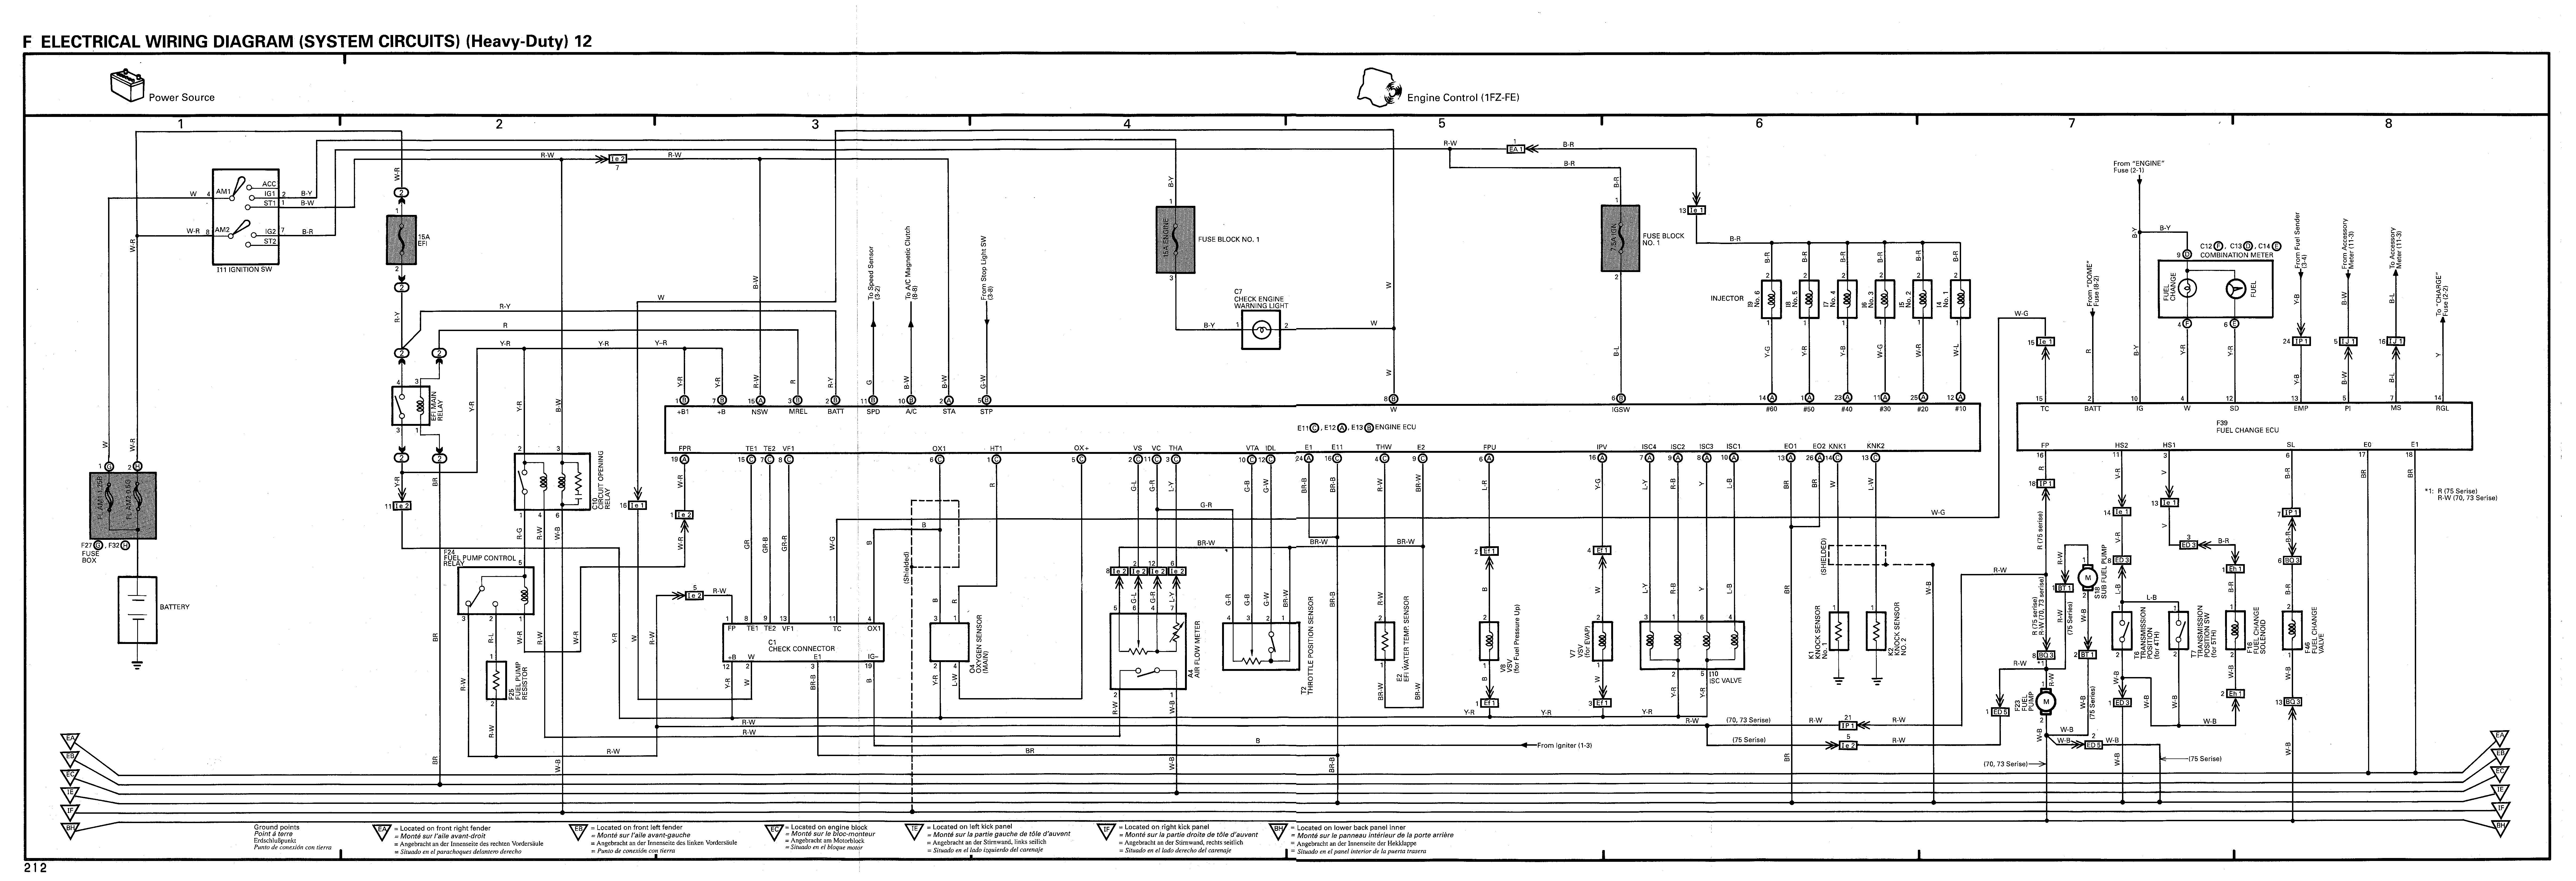 xv_5257] toyota land cruiser wiring diagrams download diagram  inama spoat onom mentra mohammedshrine librar wiring 101